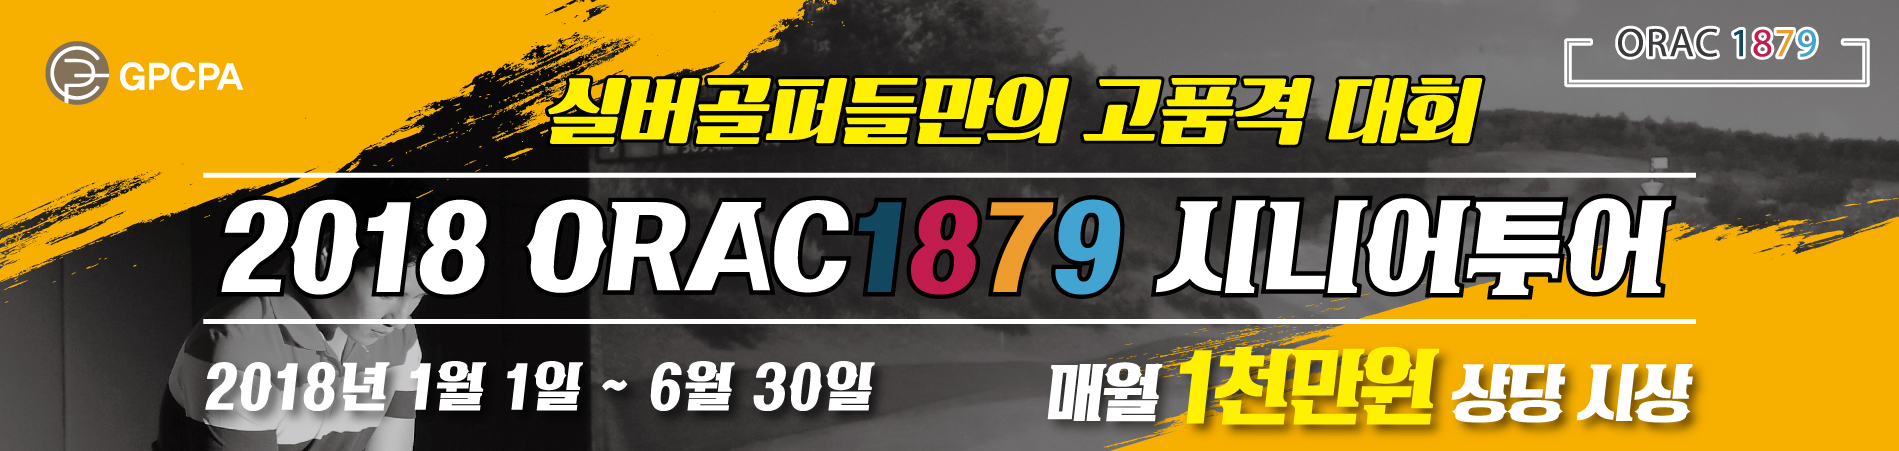 2018 ORAC1879 시니어투어